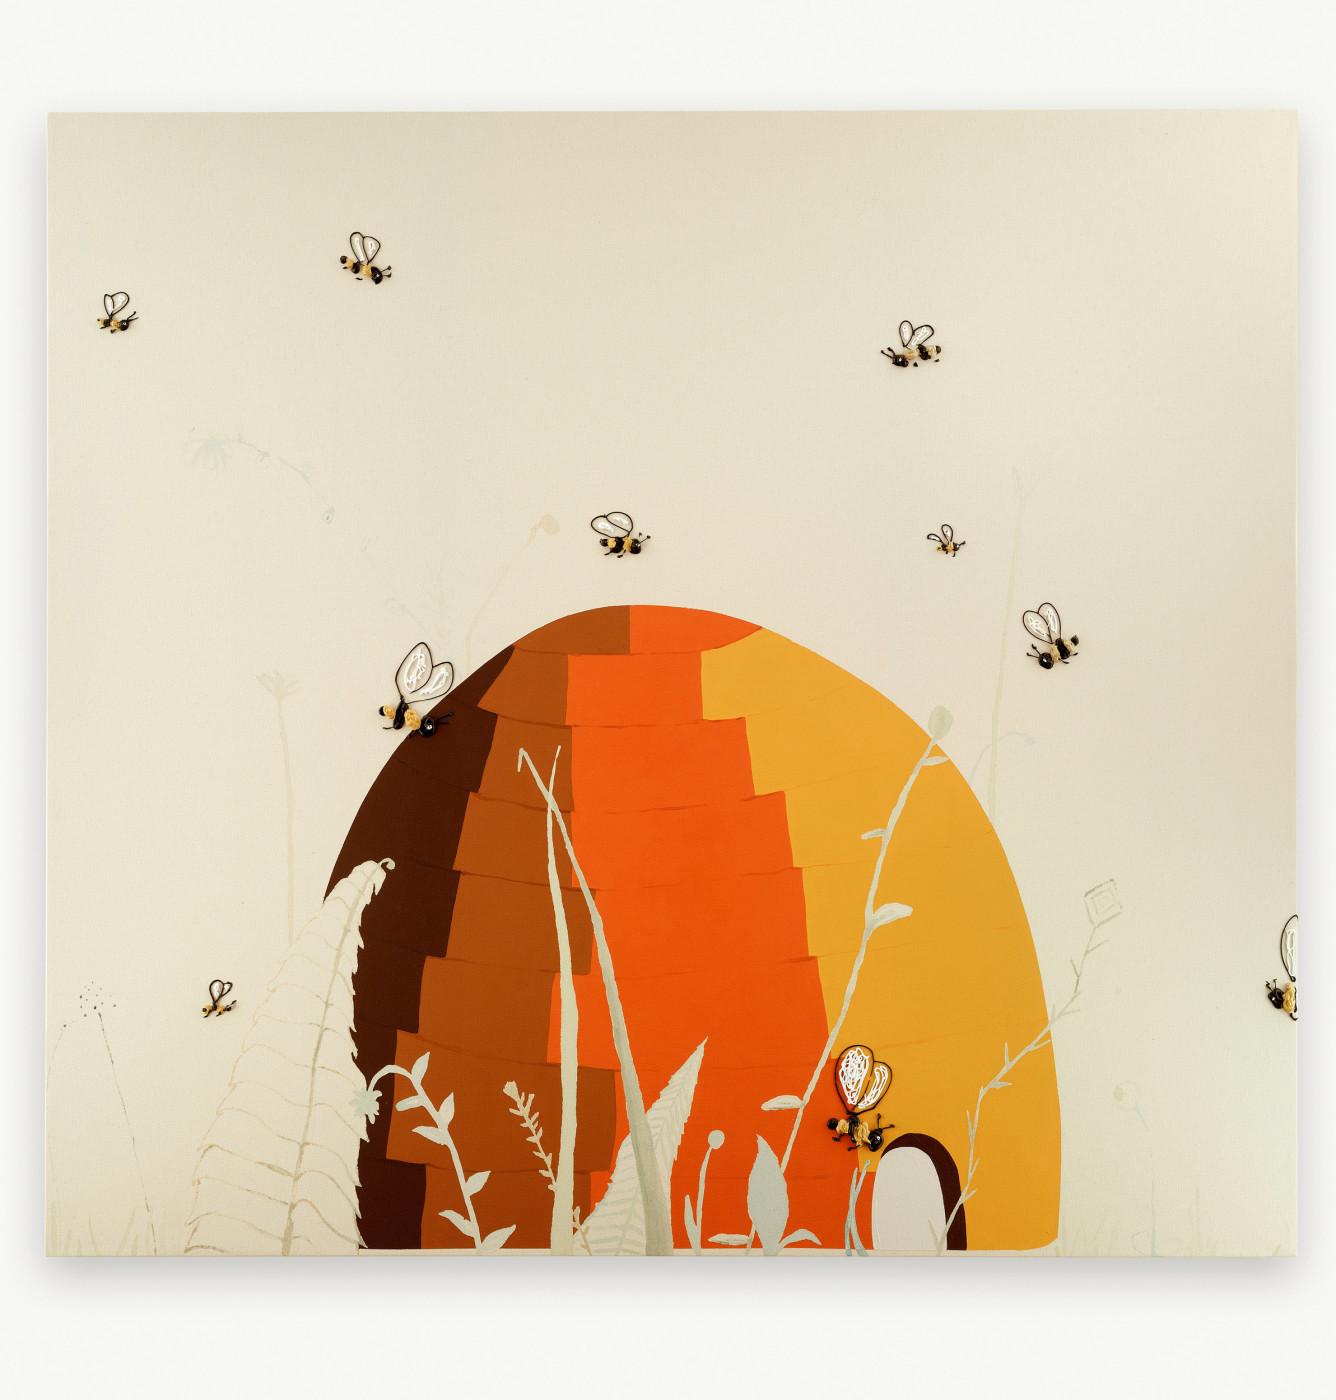 "<div class=""title""><em>Untitled (bee #2)</em>, 1998</div><div class=""medium"">acrylic on canvas</div><div class=""dimensions"">182.88 x 169.55 x 5.08 cm<br />72 x 66 3/4 x 2 in.</div>"